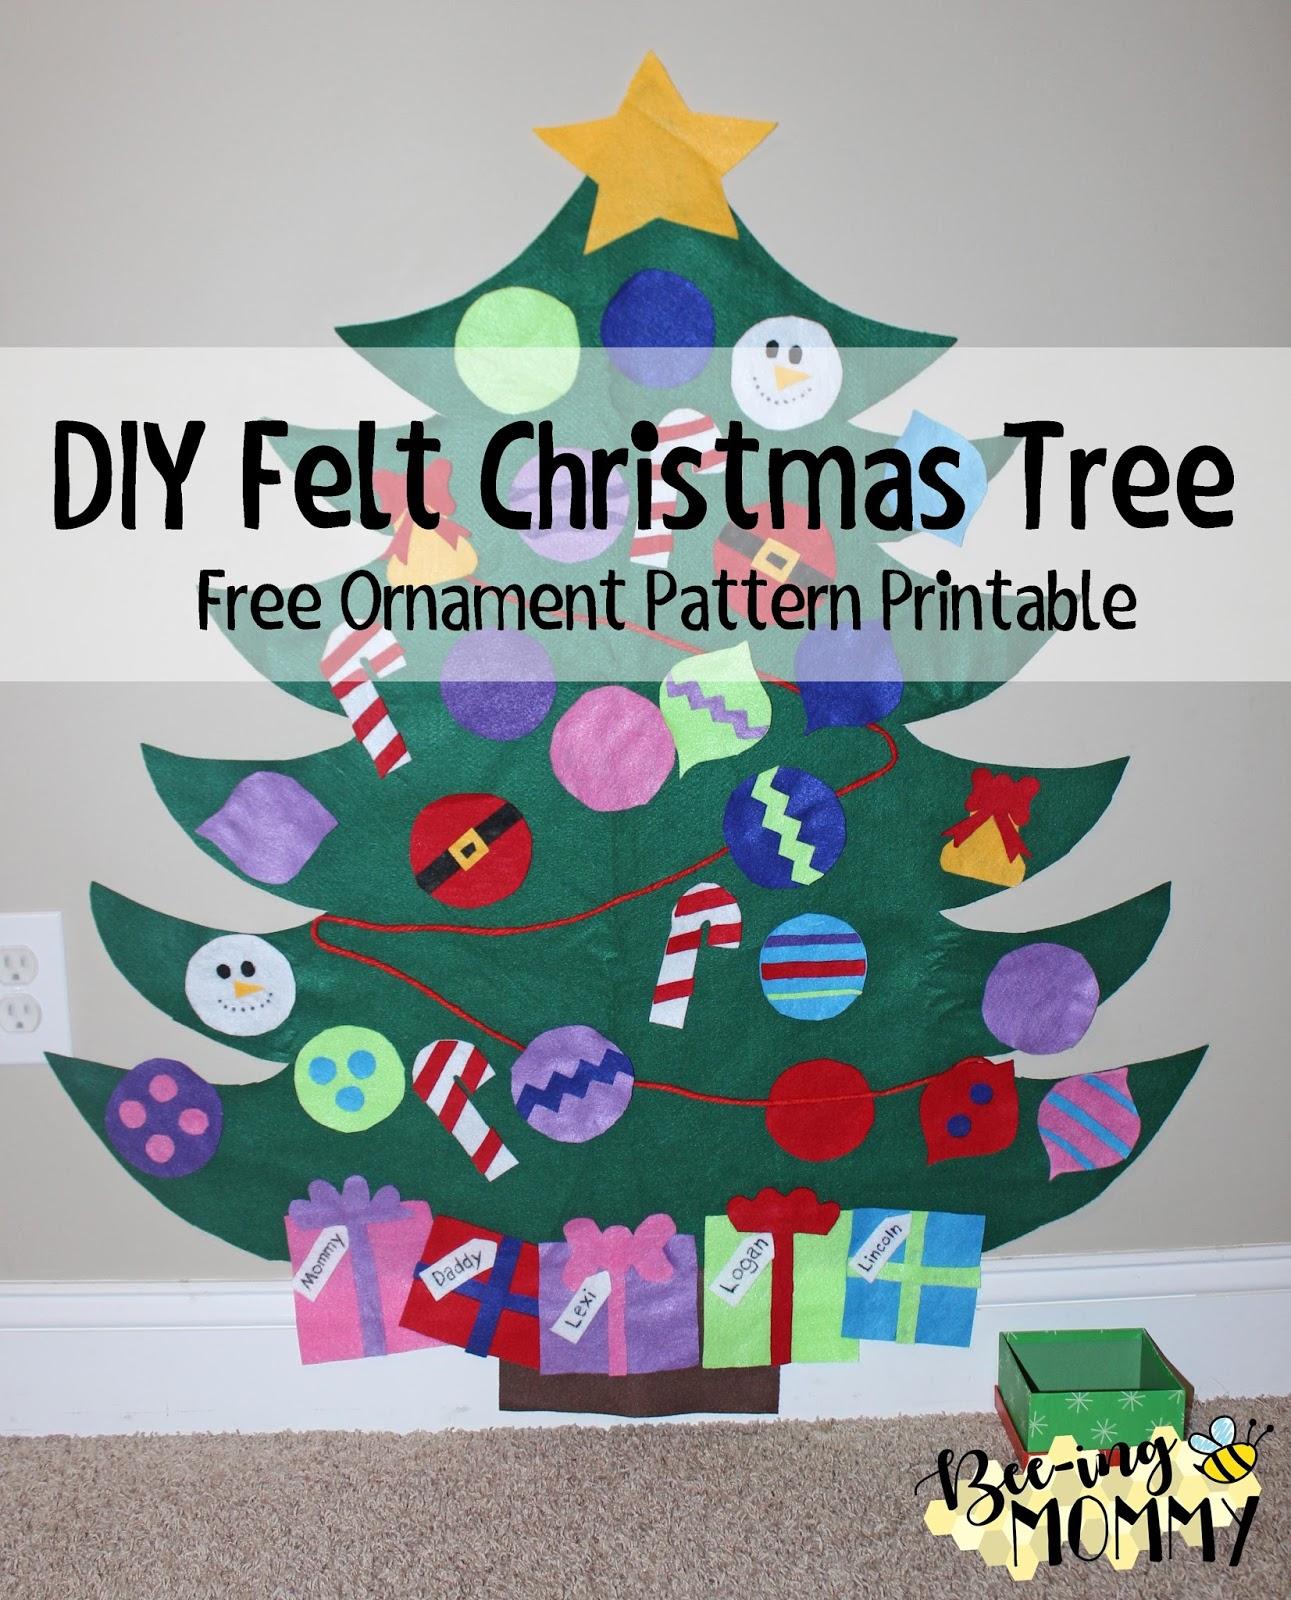 Bee-ing Mommy Blog: Felt Christmas Tree Tutorial